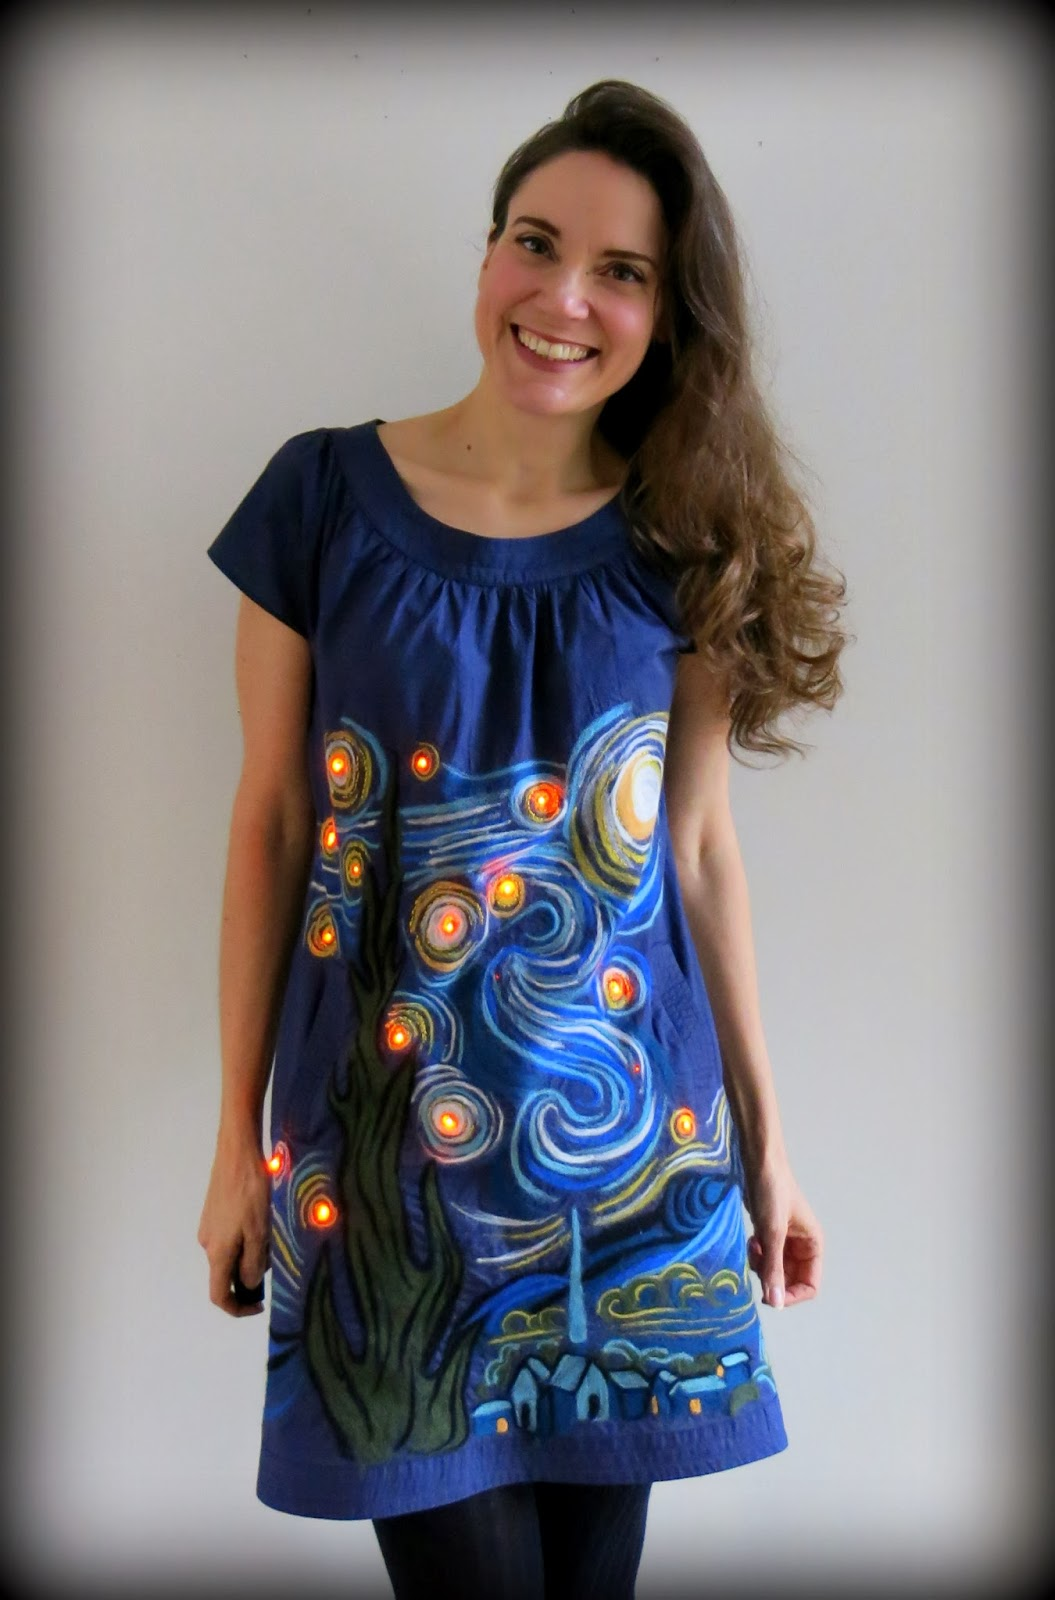 Cassie Stephens DIY A Felted LightUp Starry Night Dress